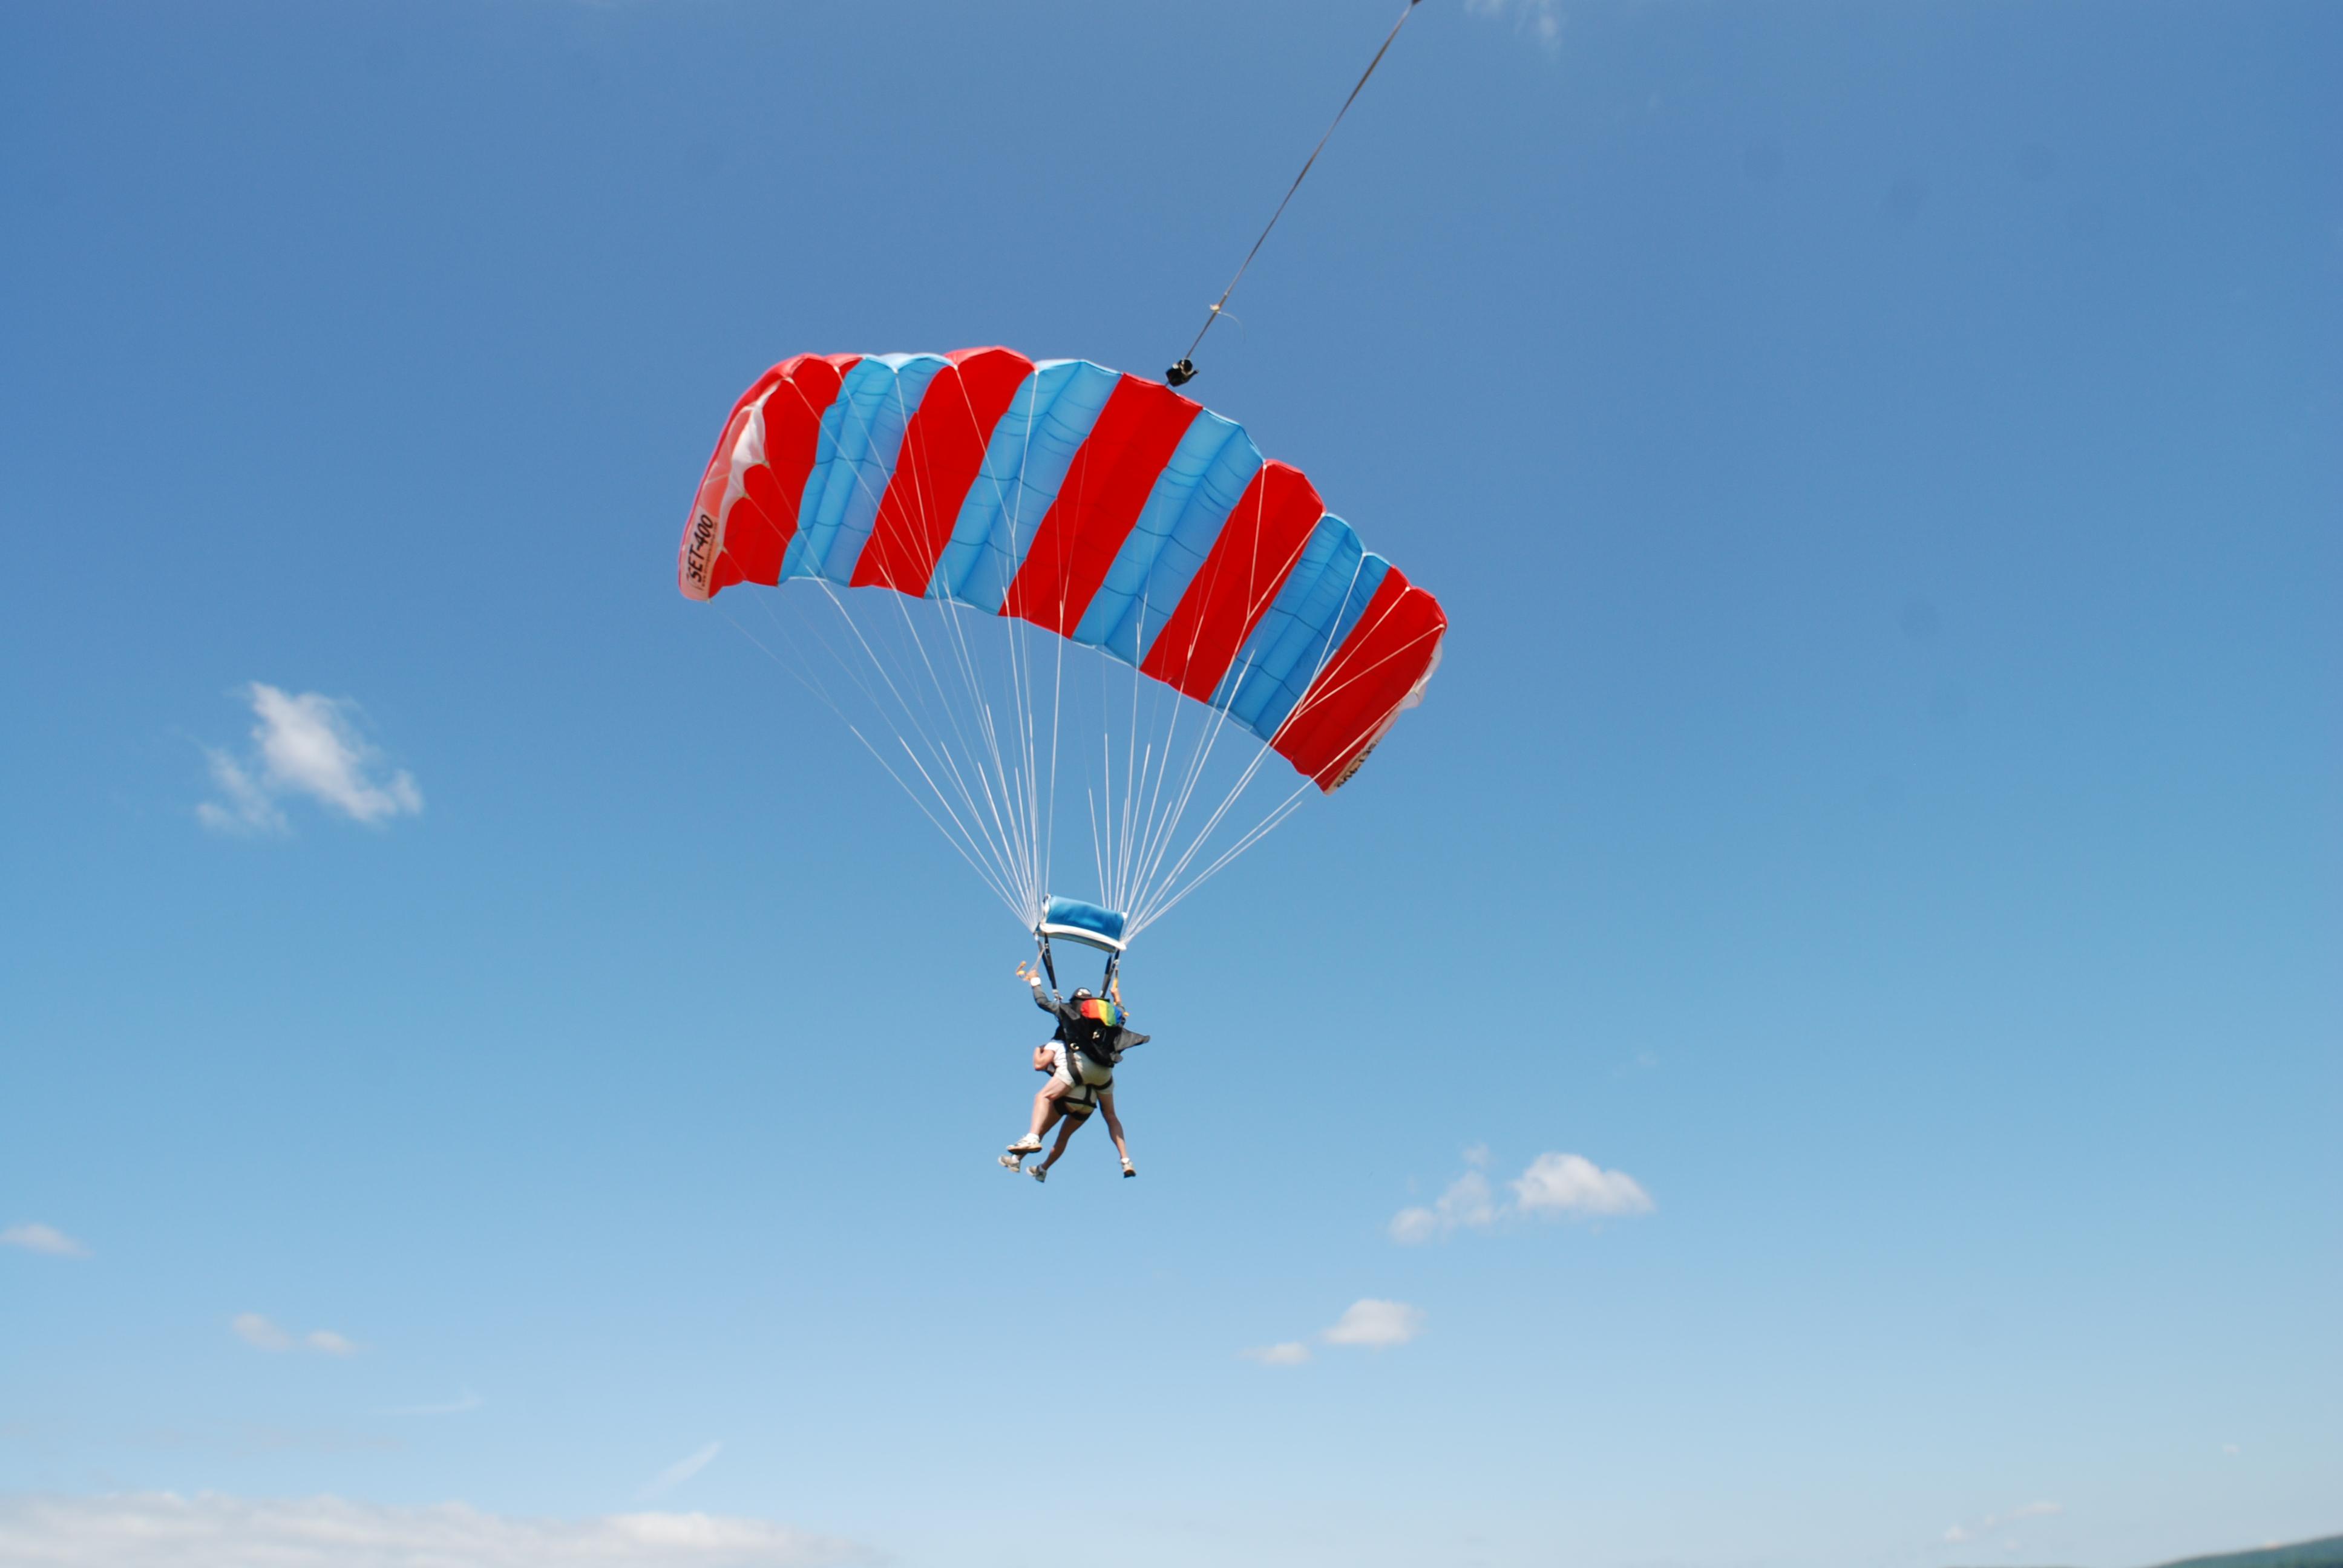 Картинки с парашютом фото